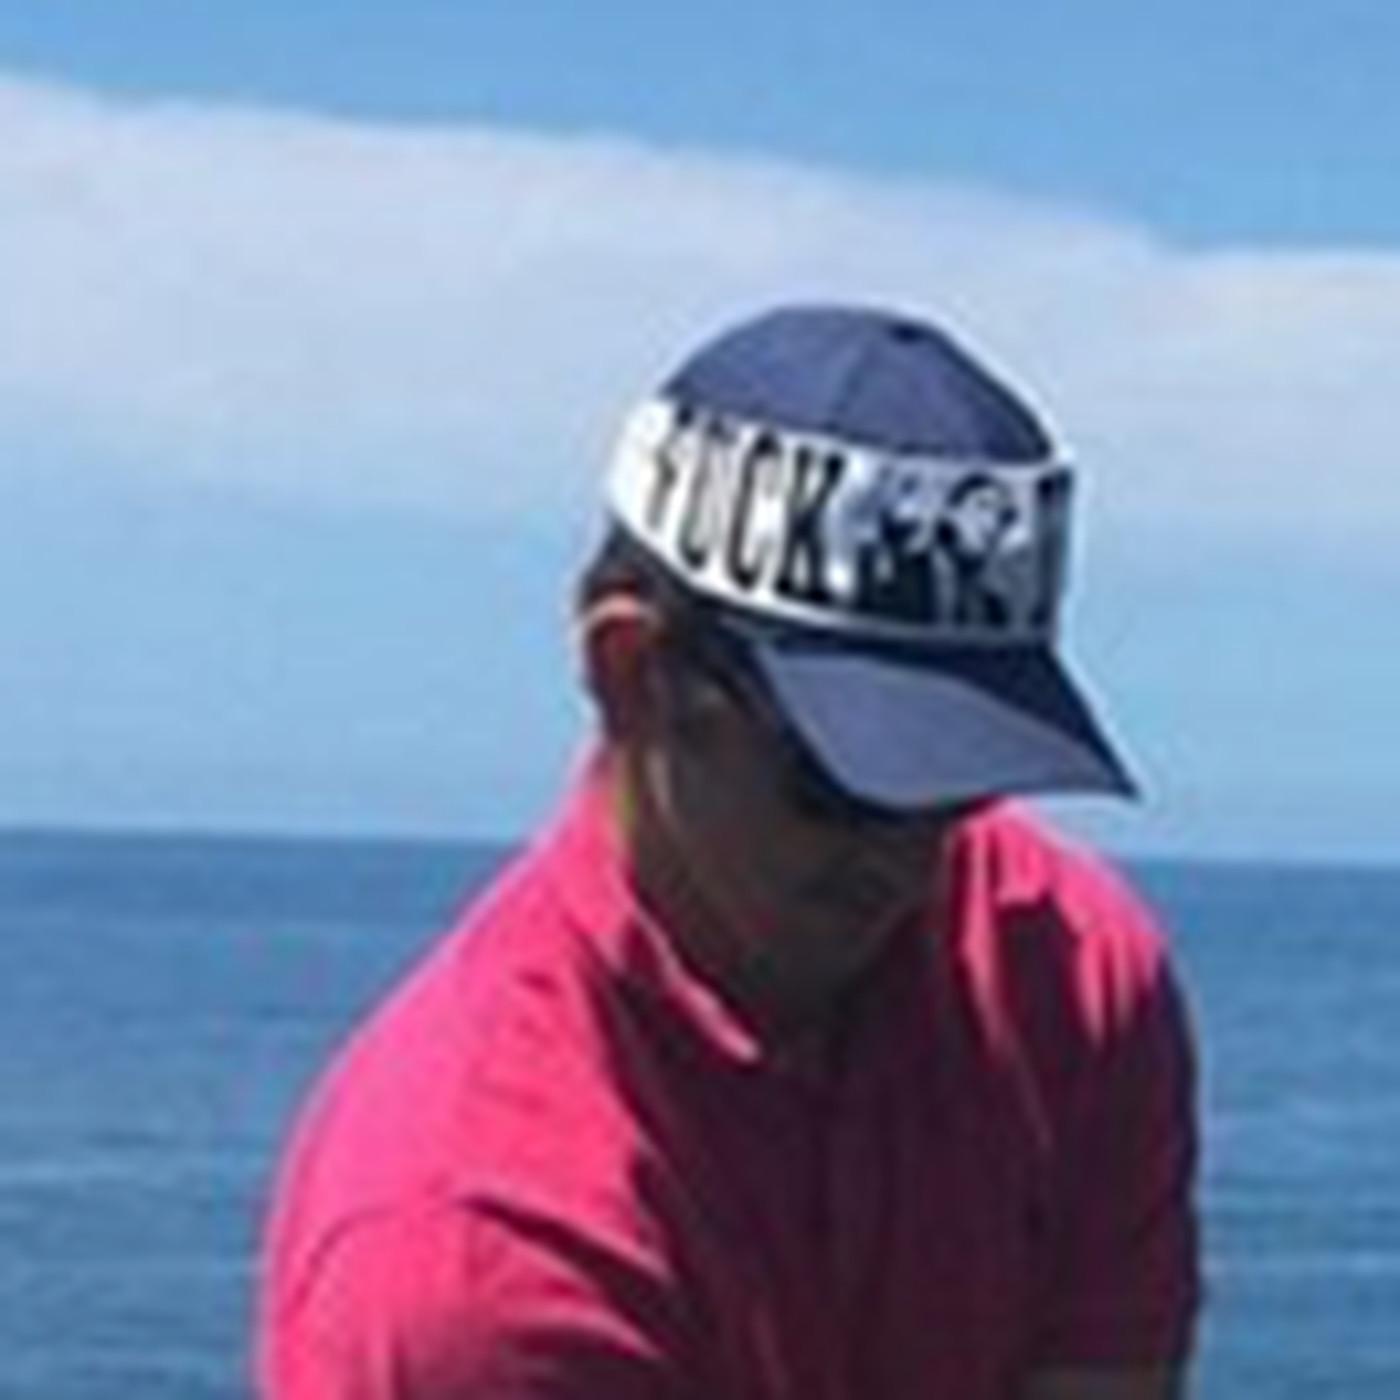 UCLA s quarterback went golfing at one of Donald Trump s courses in a  F ck  Trump  hat - SBNation.com d20737c5415